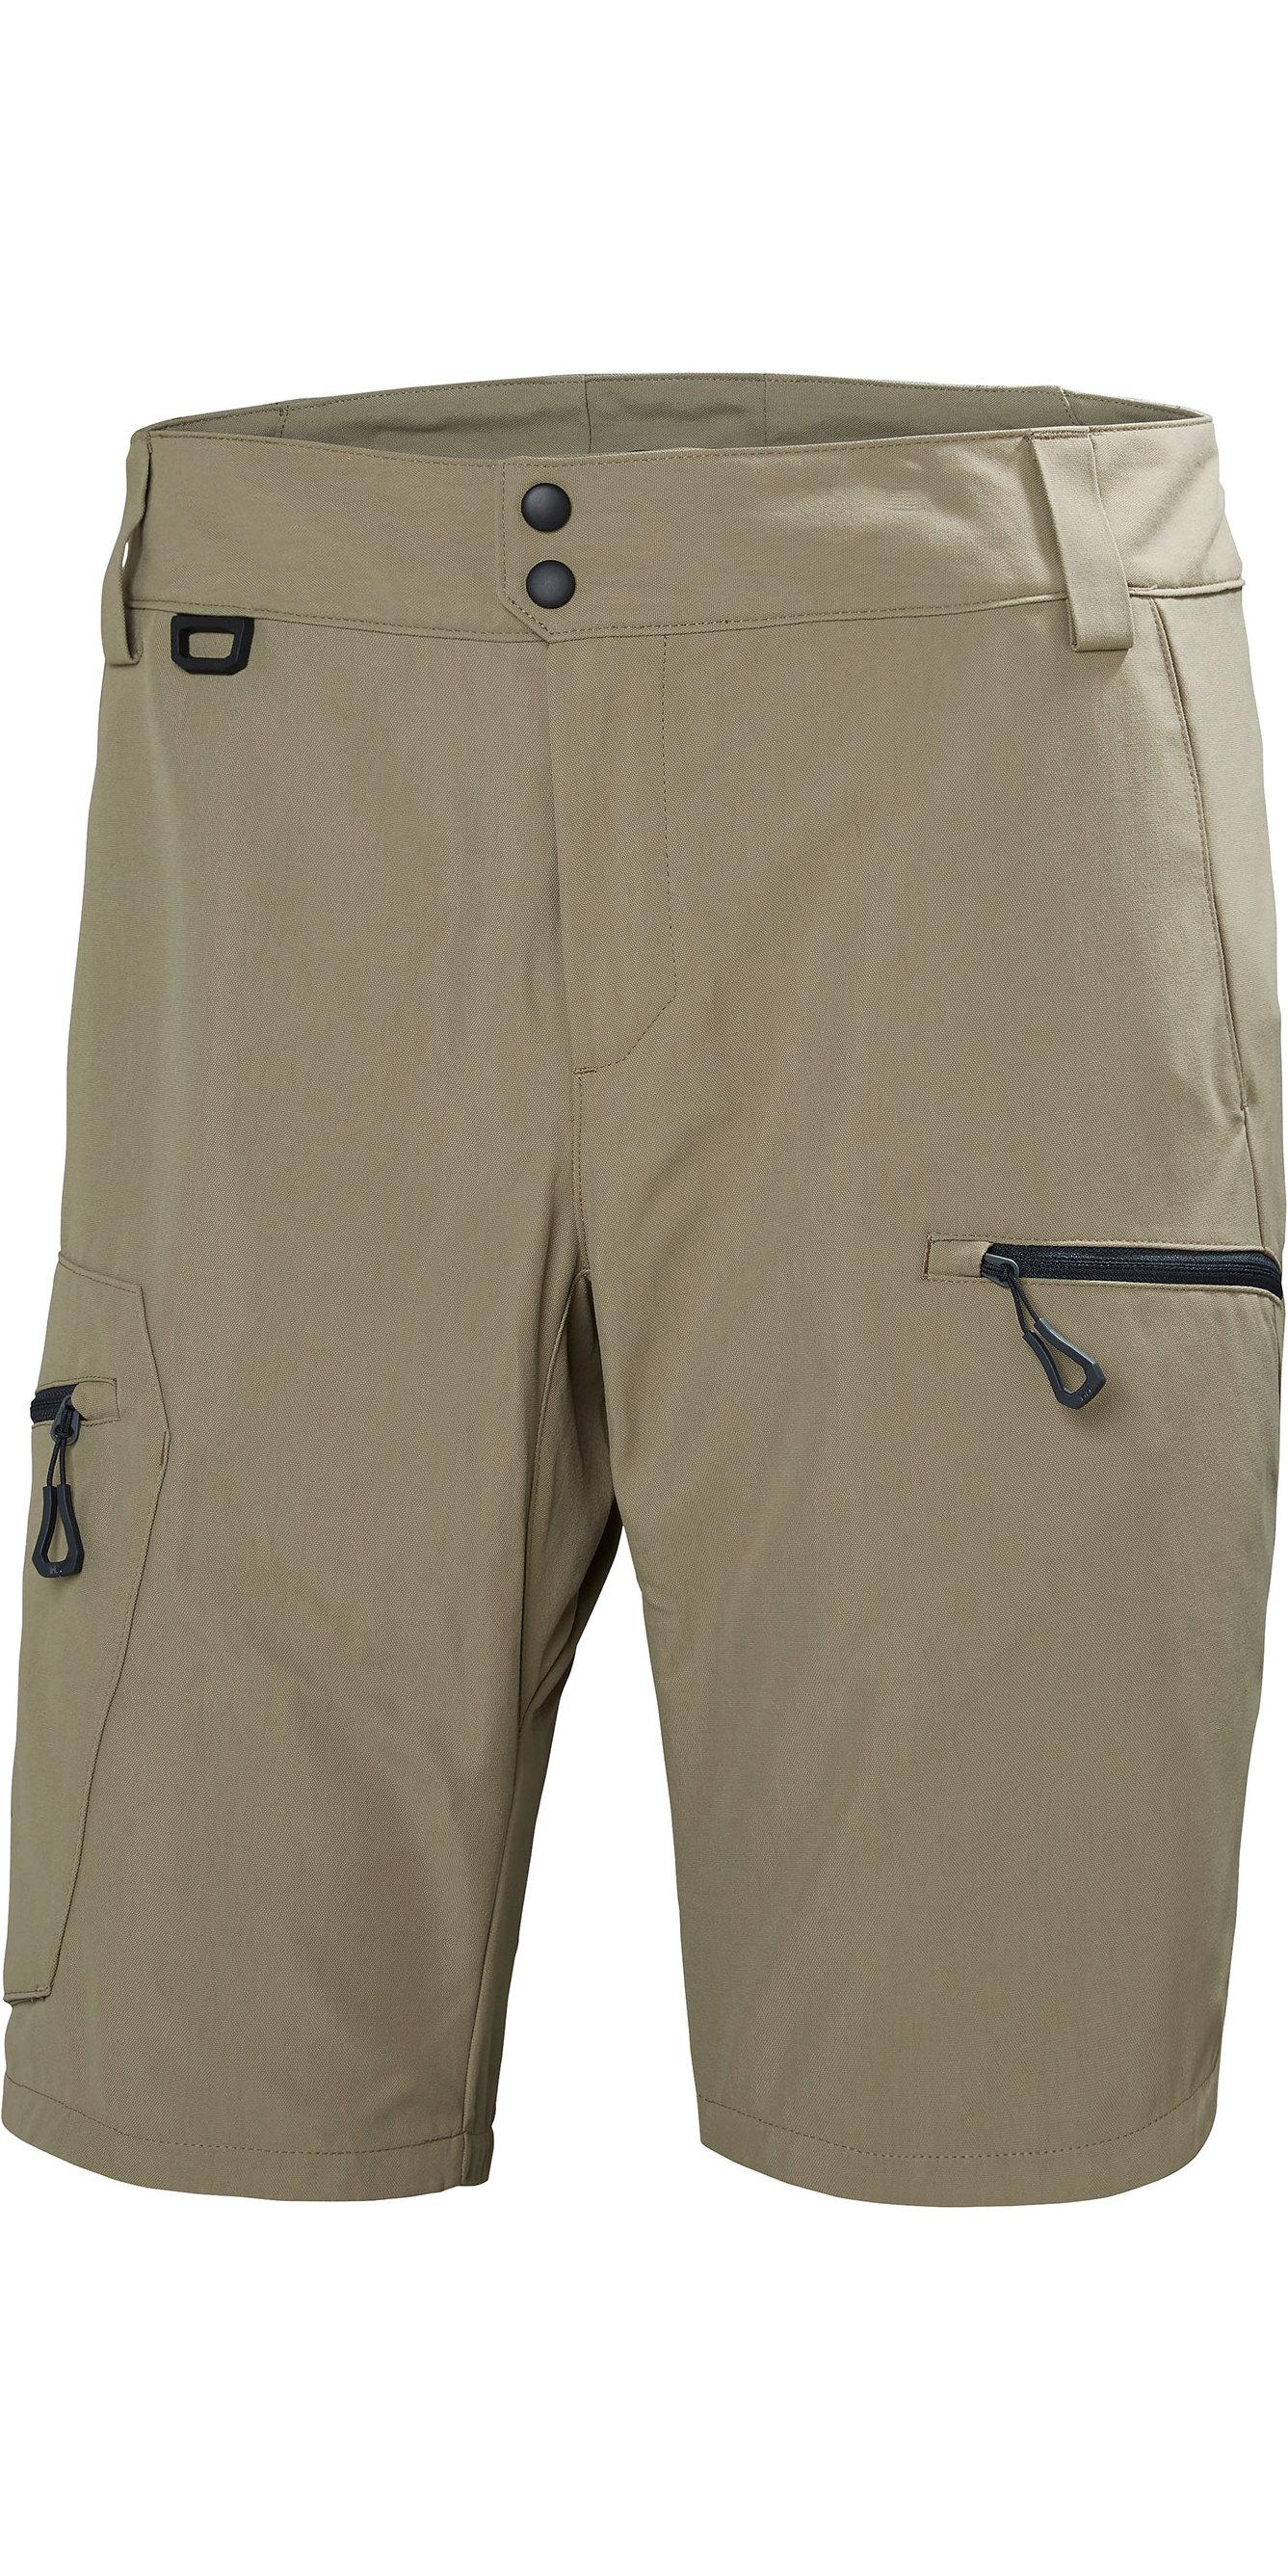 c9a11062f8 2019 Helly Hansen Mens Crewline Cargo Shorts Fallen Rock 33937 - Technical  Sailing Shorts | Wetsuit Outlet